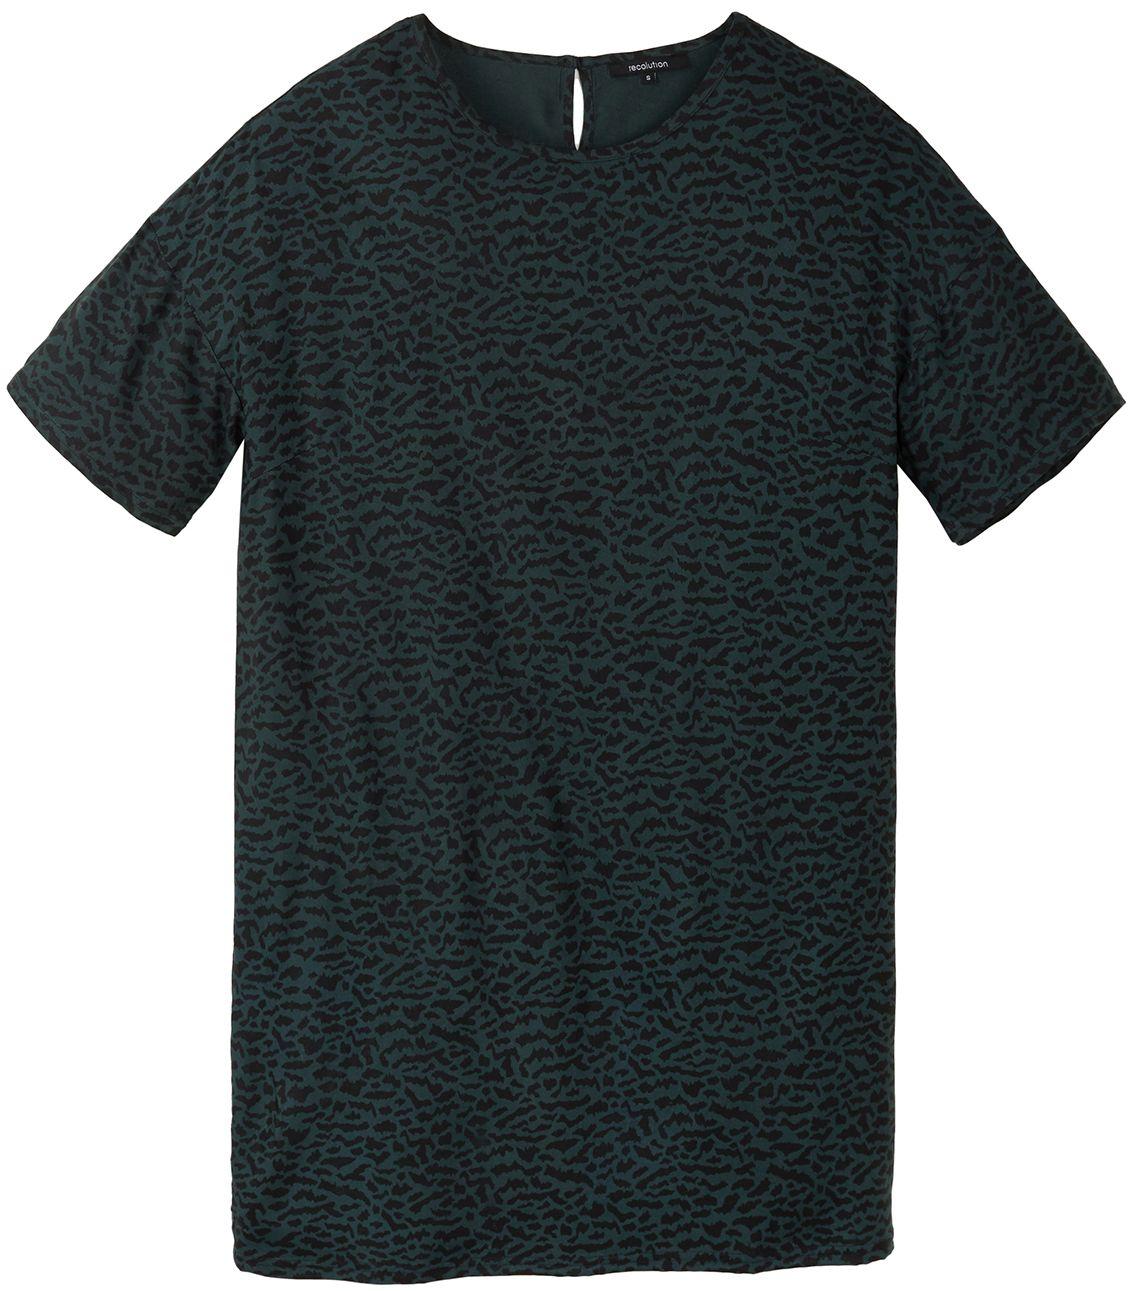 Gemustertes Damen-Kleid CLOVER ABSTRACT deep green